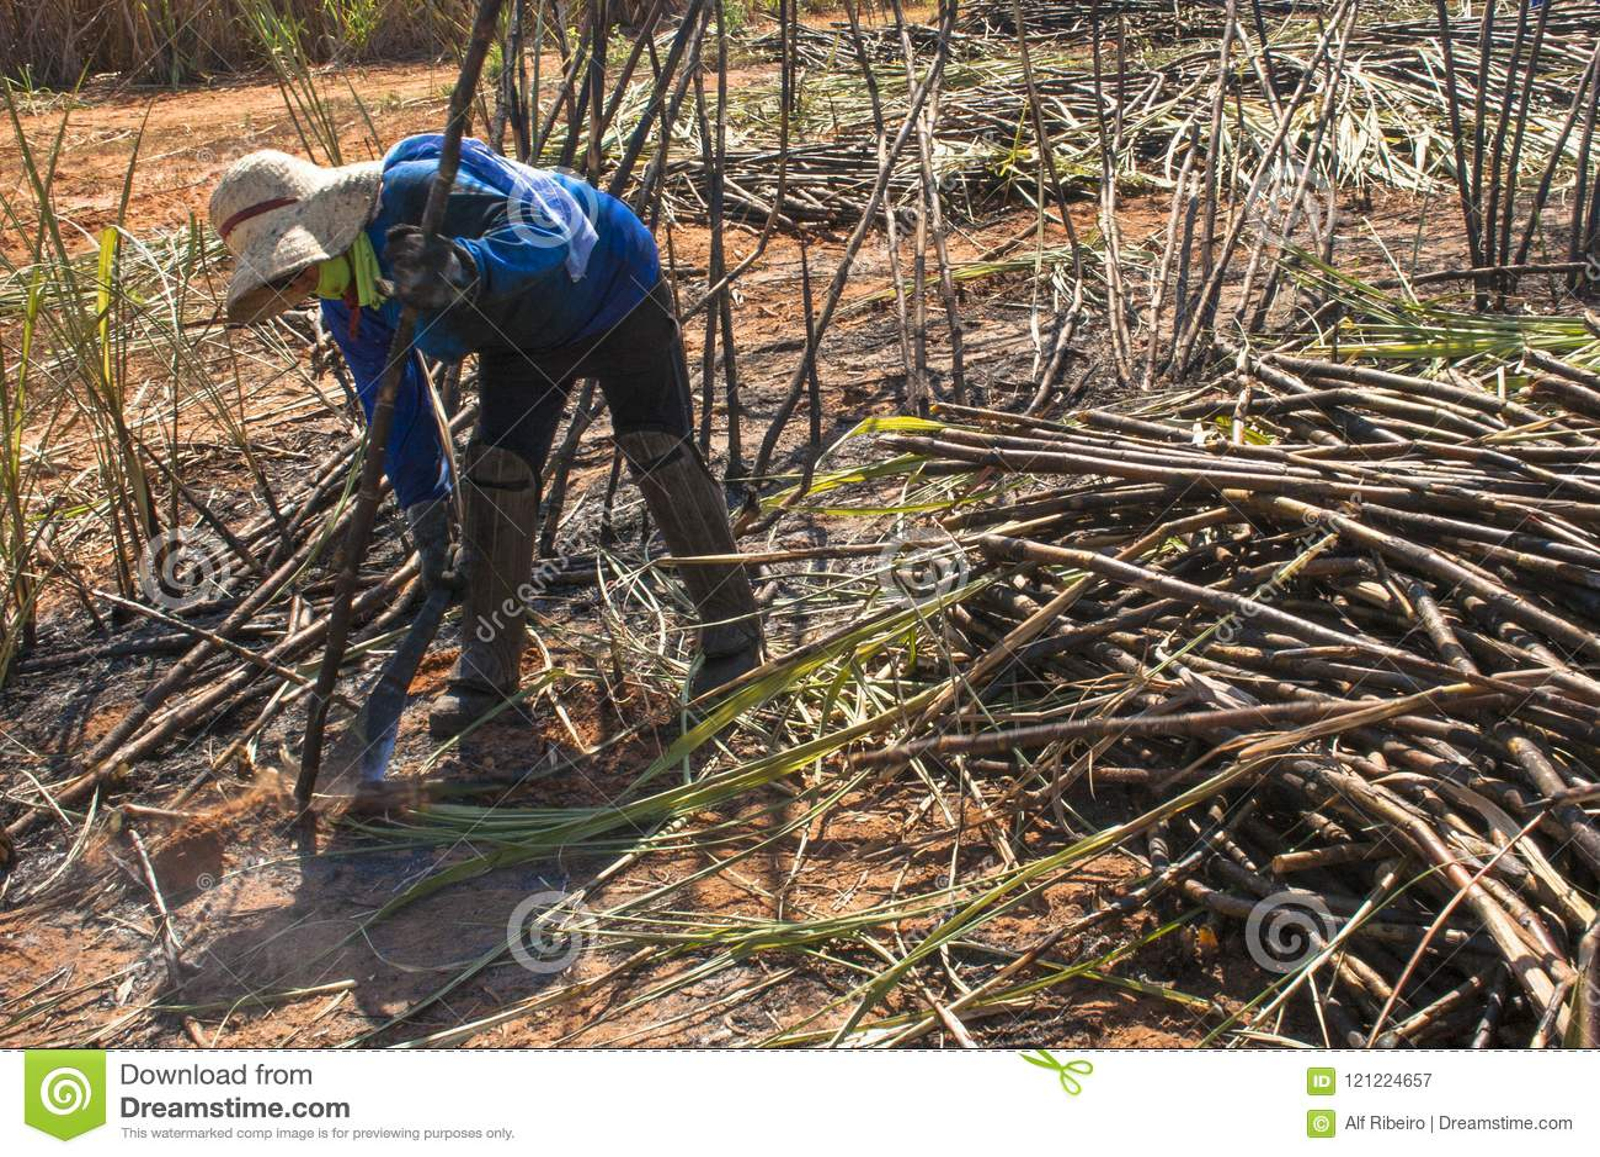 Sugar cane manual harvesting